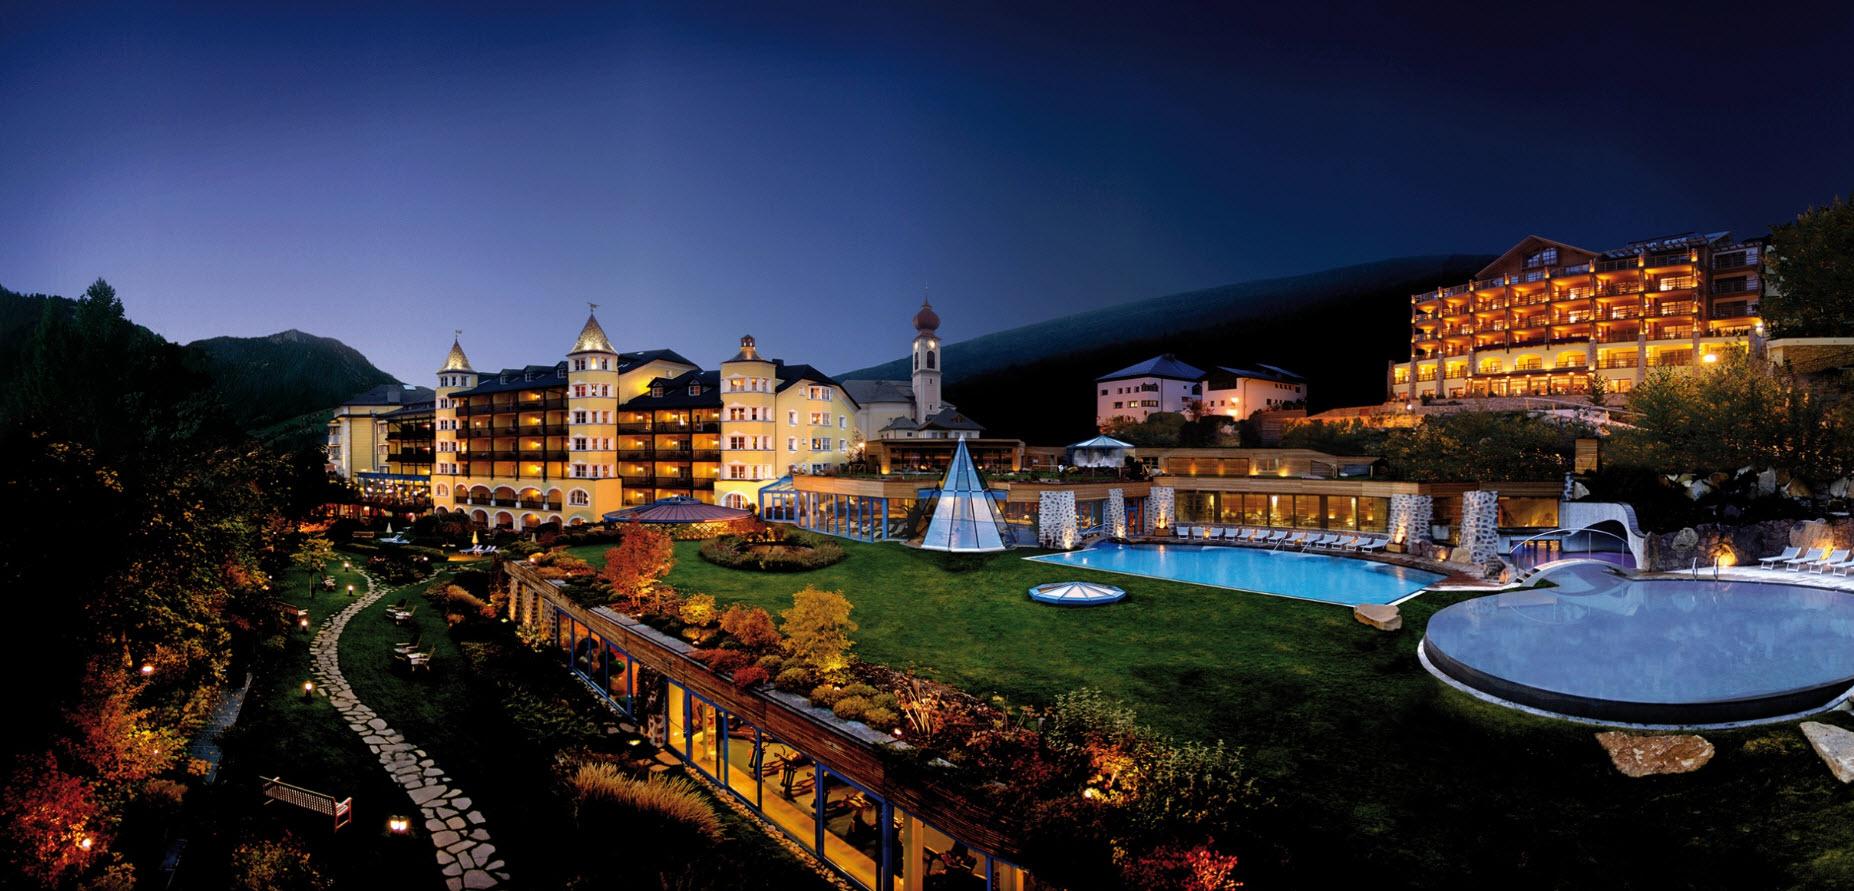 Adler Spa Resort Dolomiti - Dormir - Dolomites (c) Adlersparesorts